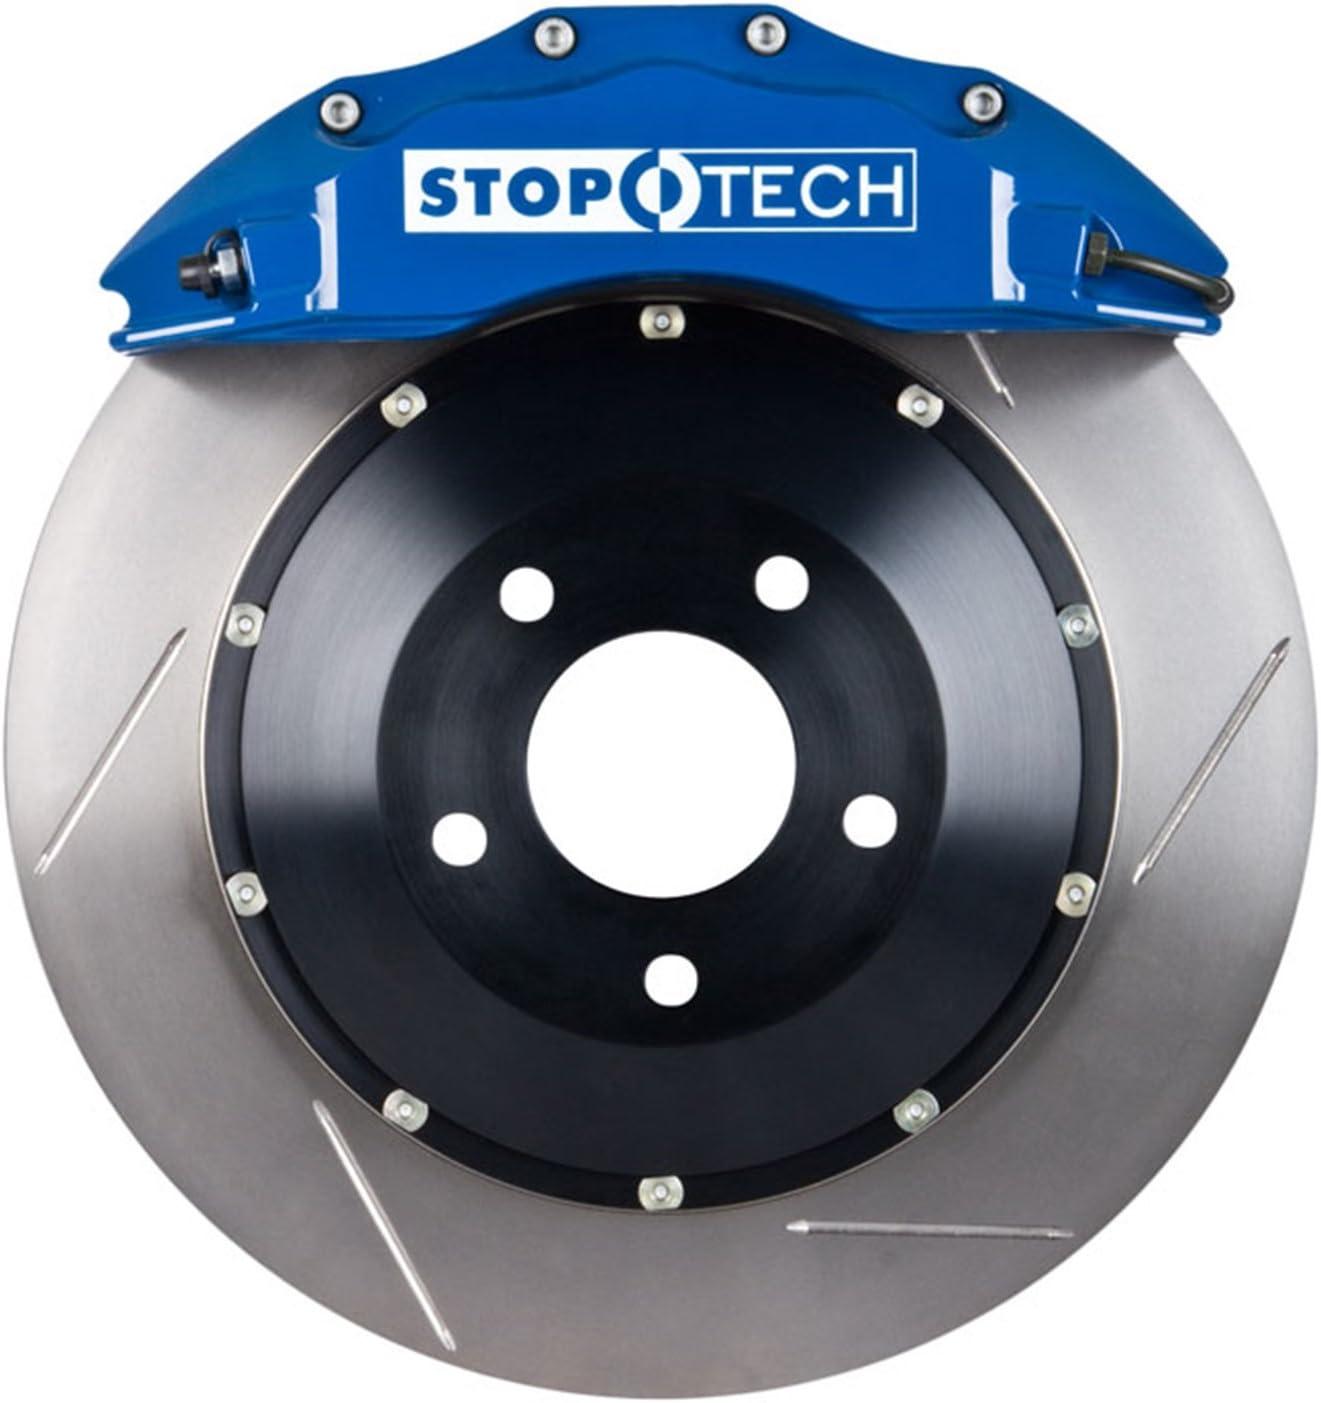 StopTech 83.137.6800.21 Big Brake Sales Kit Piece Rotor; Front Low price 2